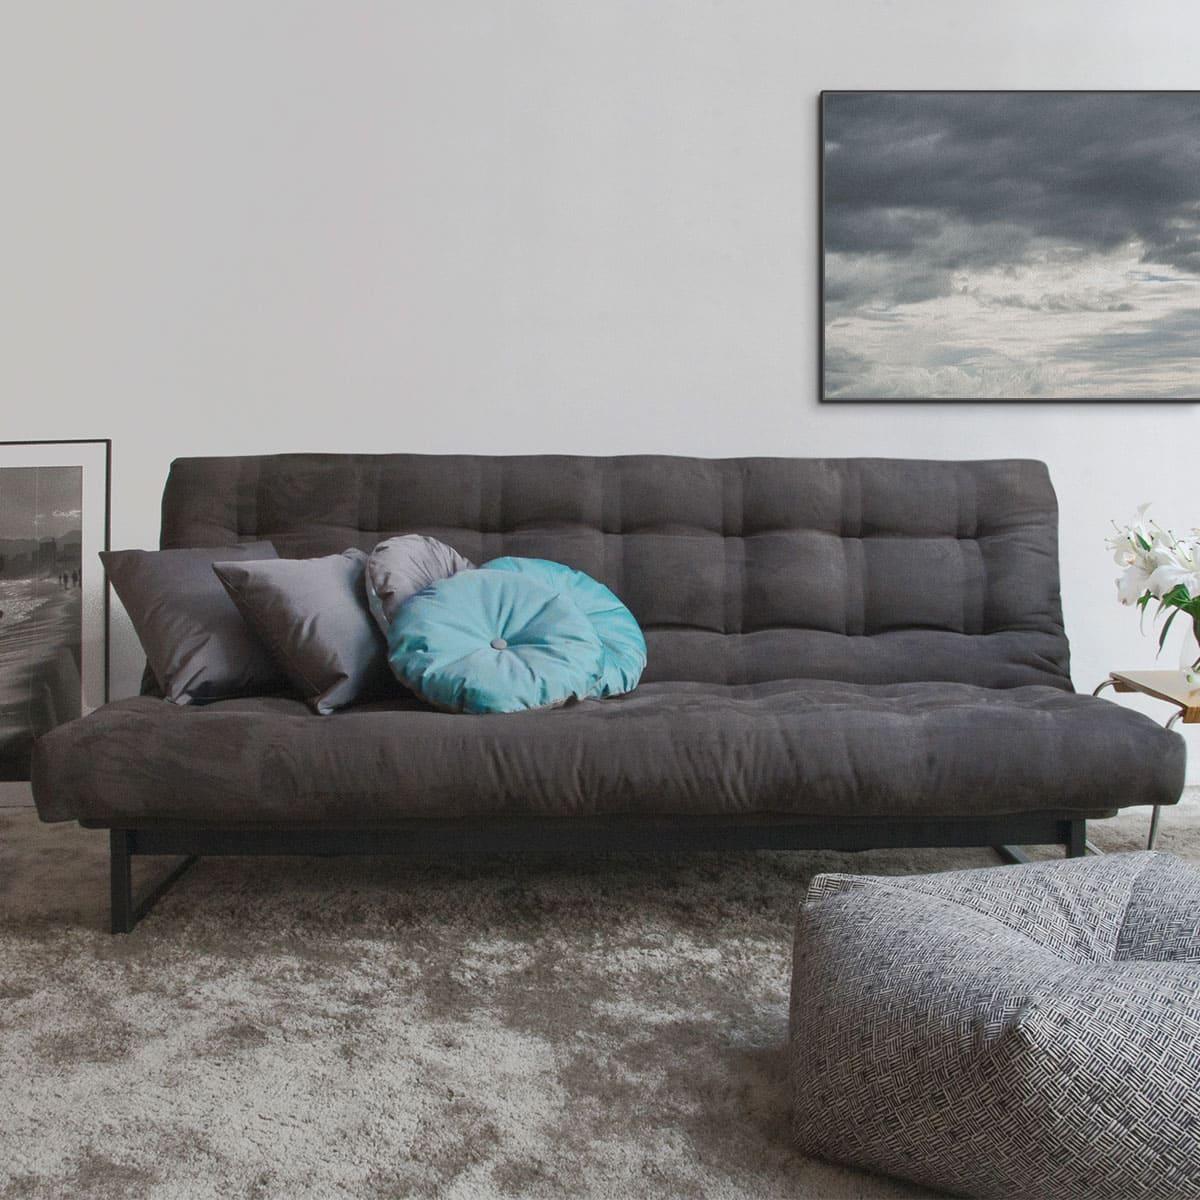 Sofa cama futon company - Sofas cama futon ...